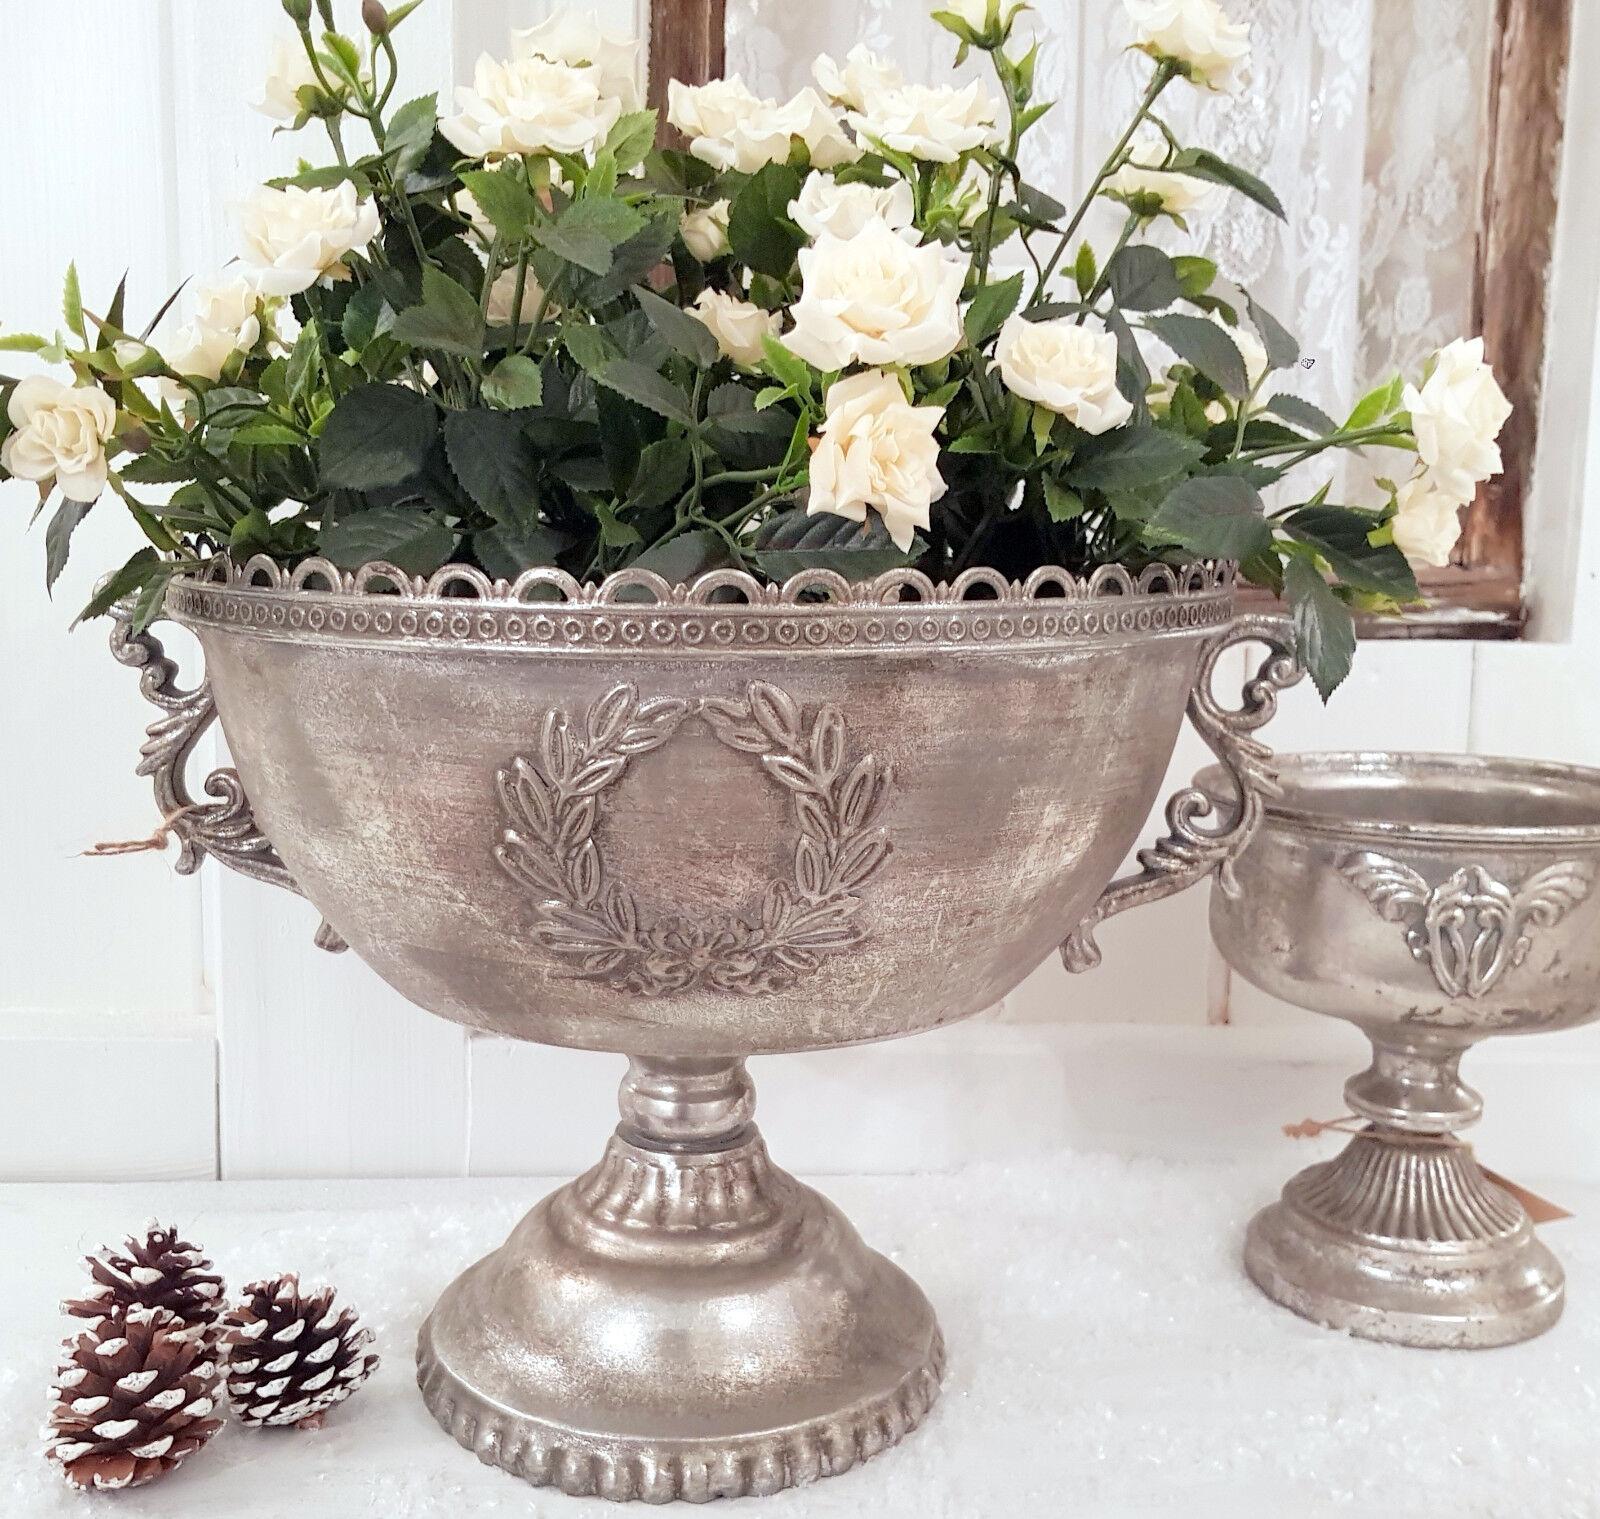 Pokal Amphore XL Pflanzschale Antik Silber Metall Sabby Vintage Landhaus Nr. 20